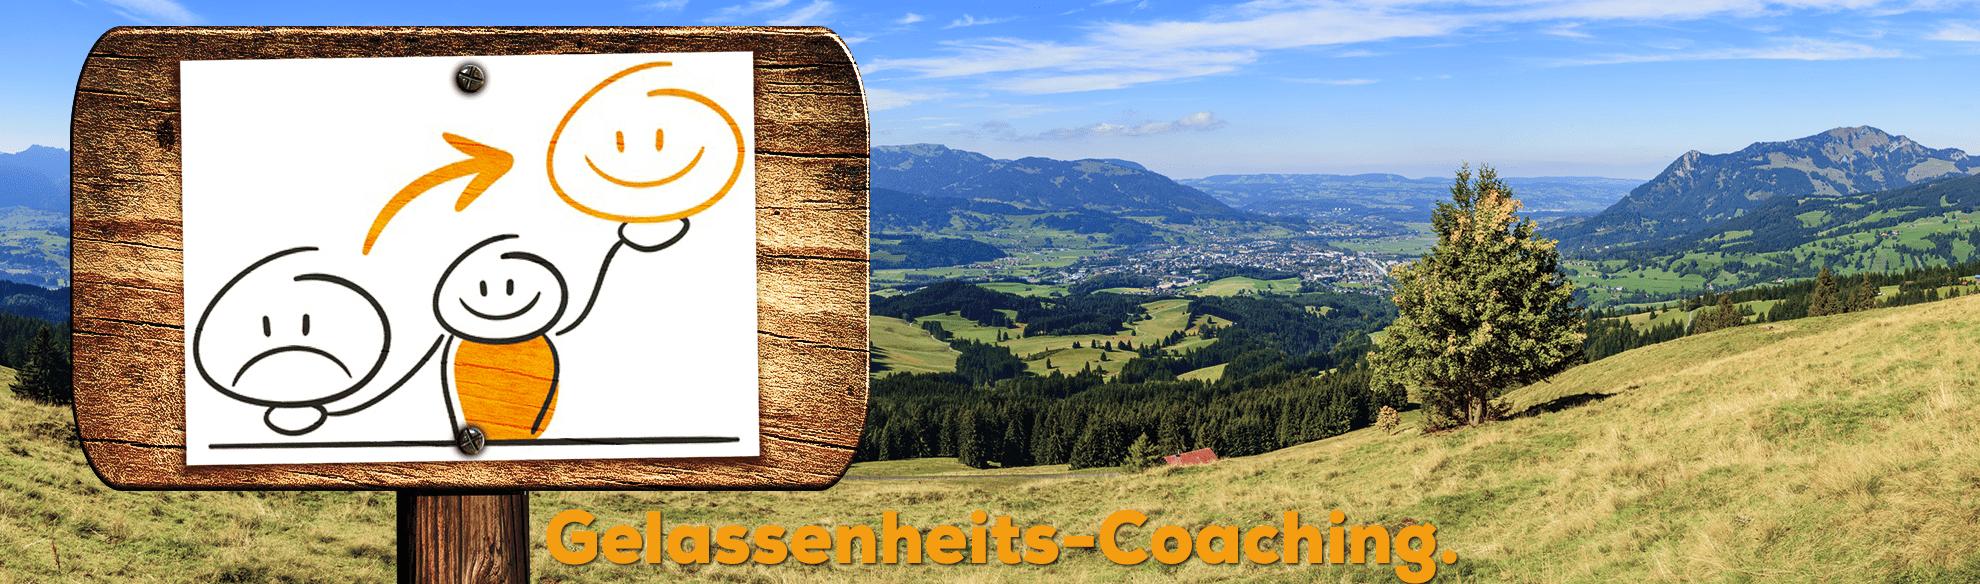 hhwille-gelassenheits-coaching